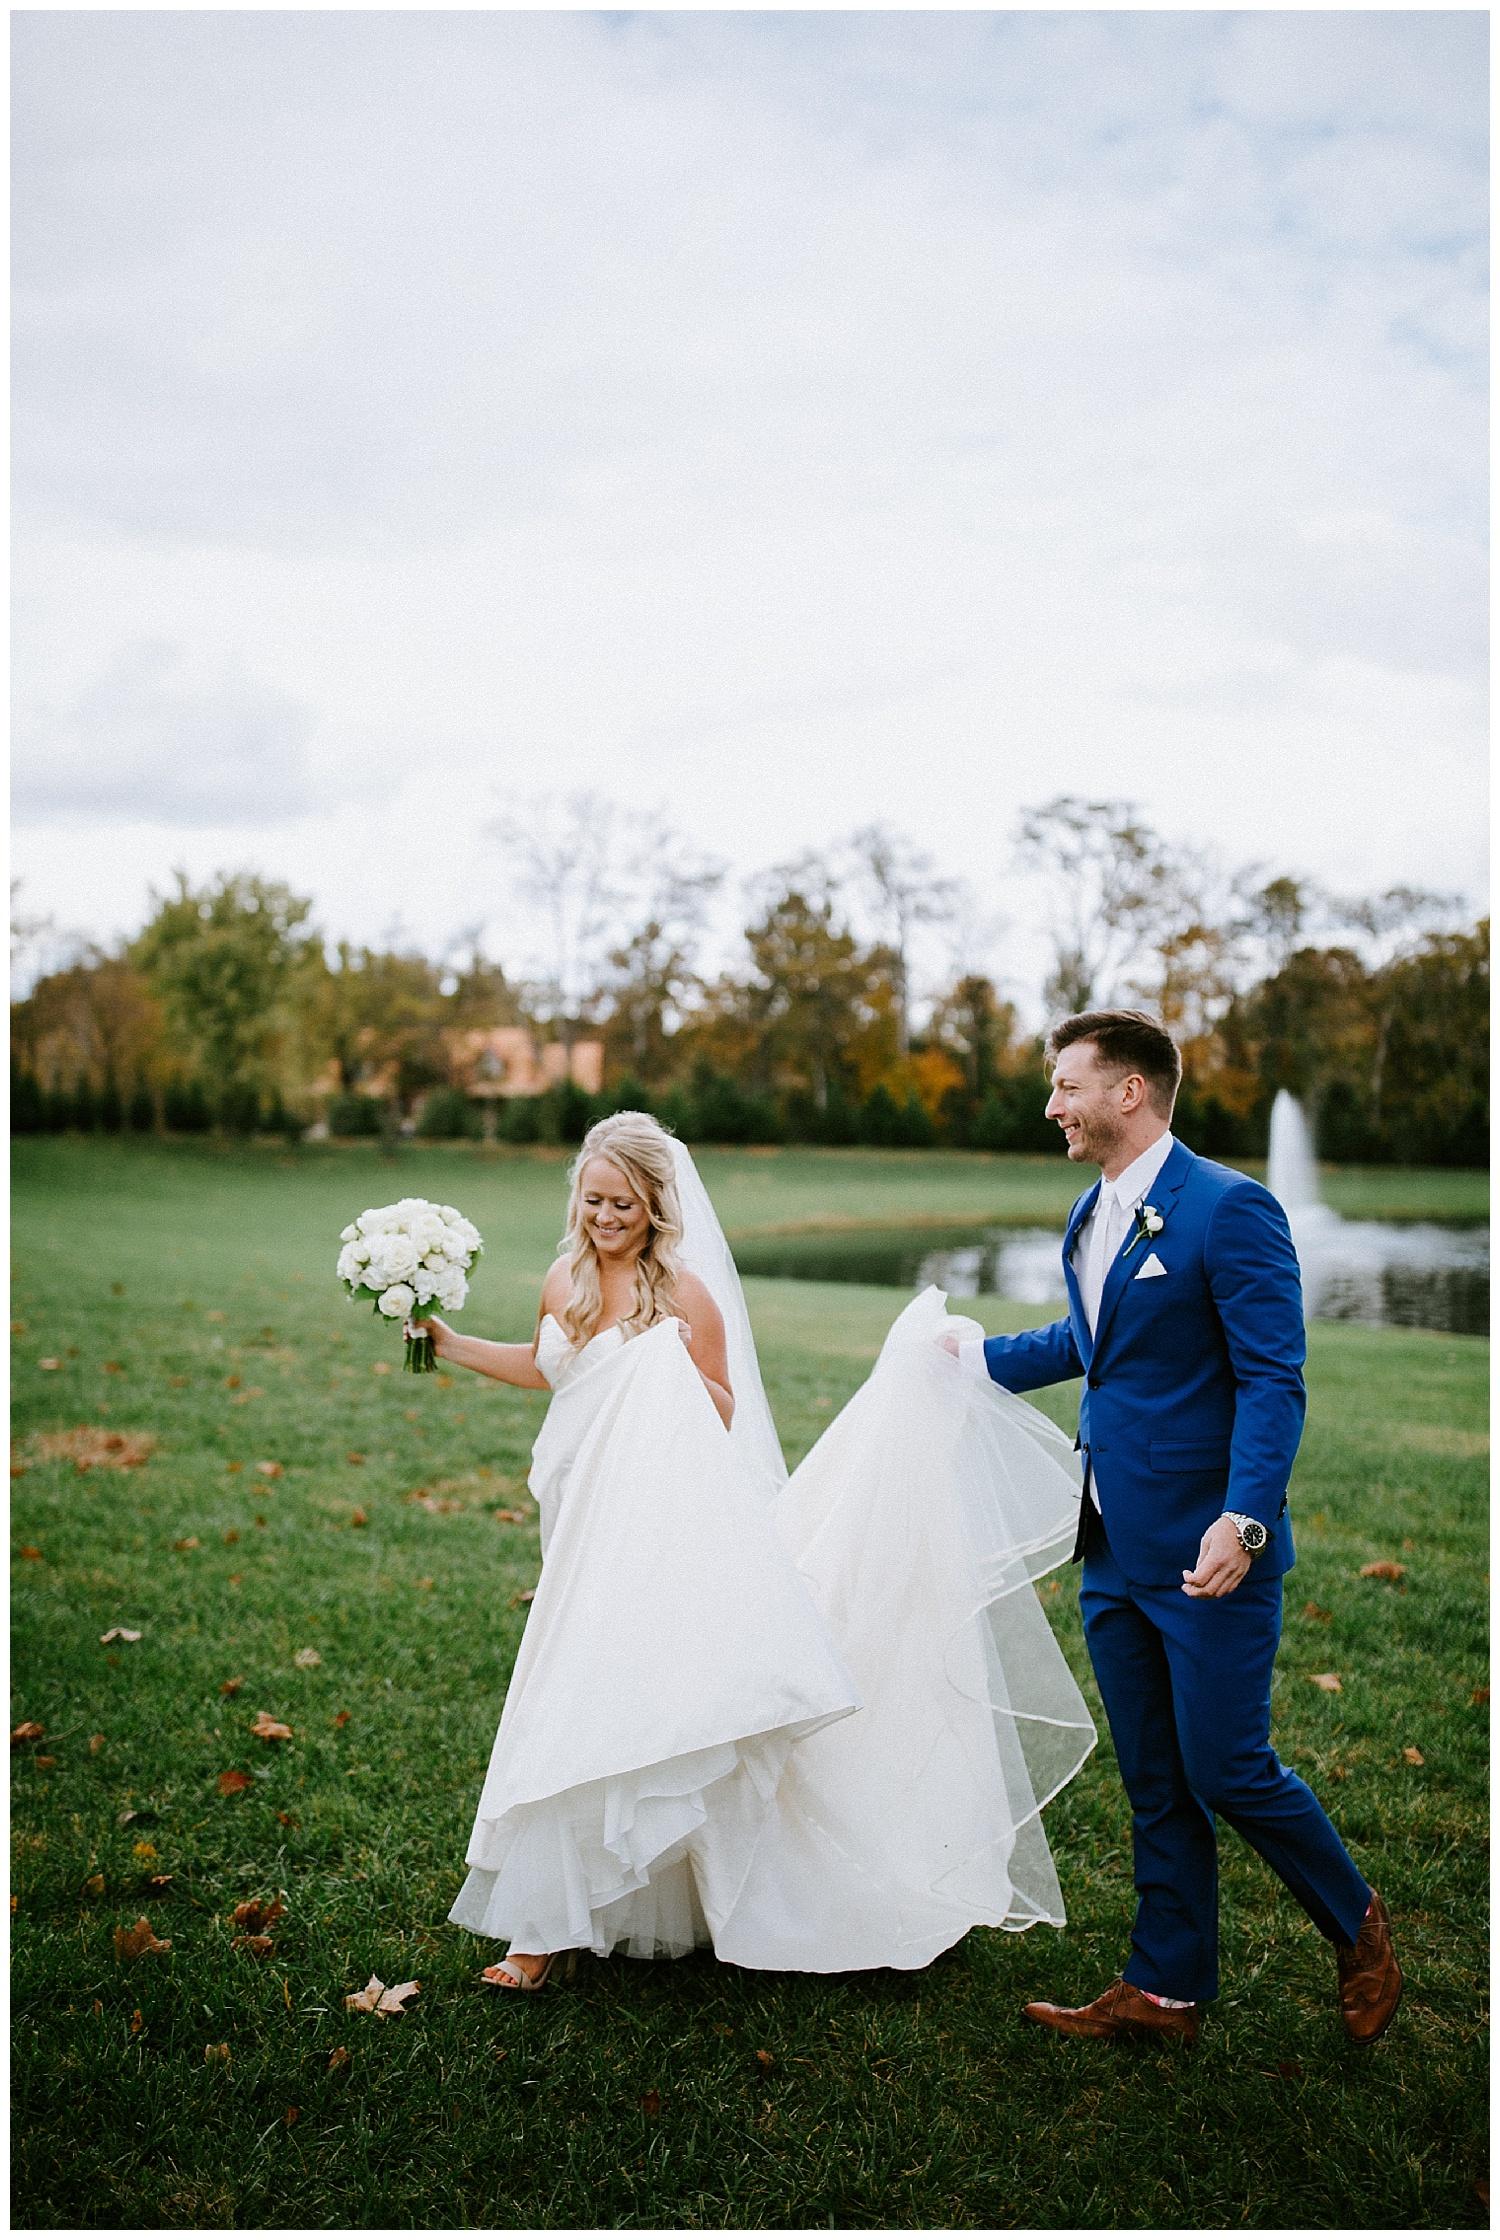 classy-wedding-sycamore_farms-nashville-tn2019-01-22_0028.jpg